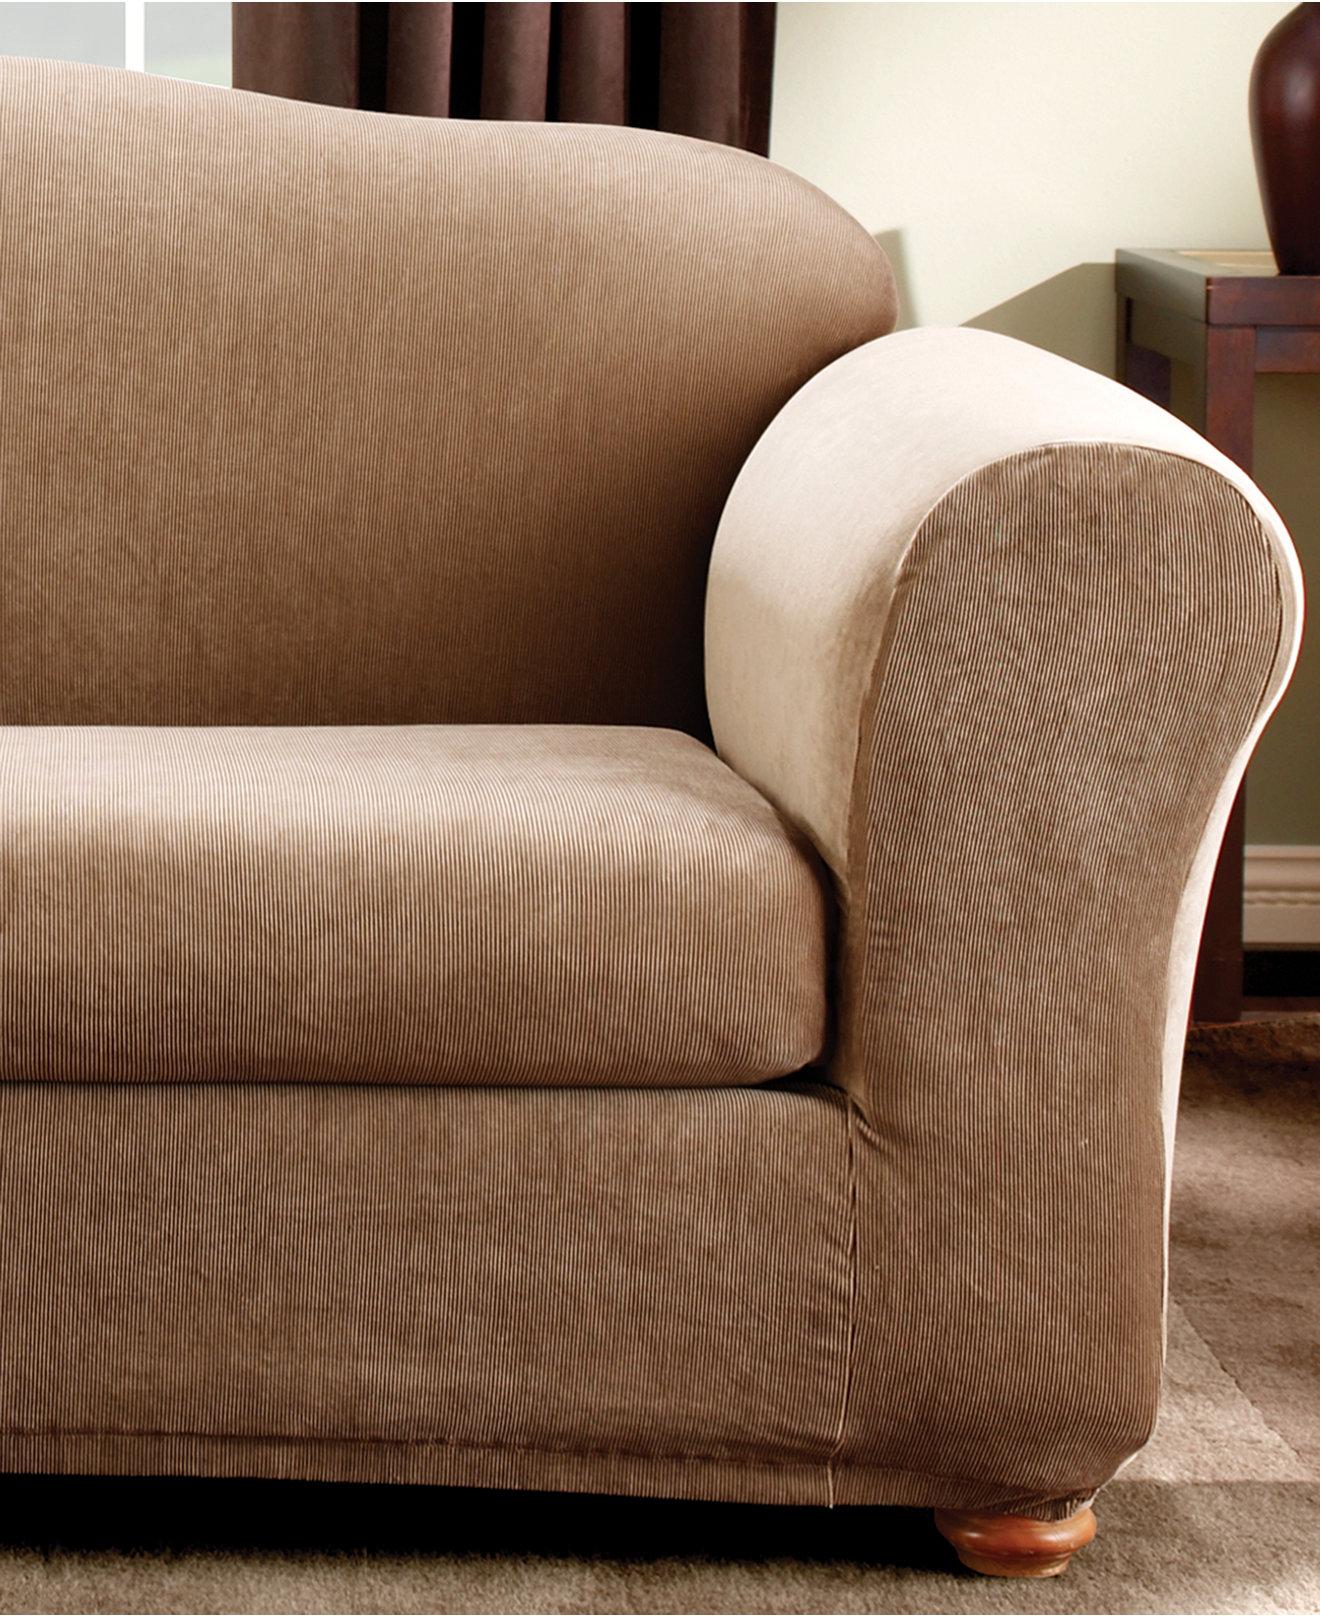 Image Of Modular Sectional Sofa Covers